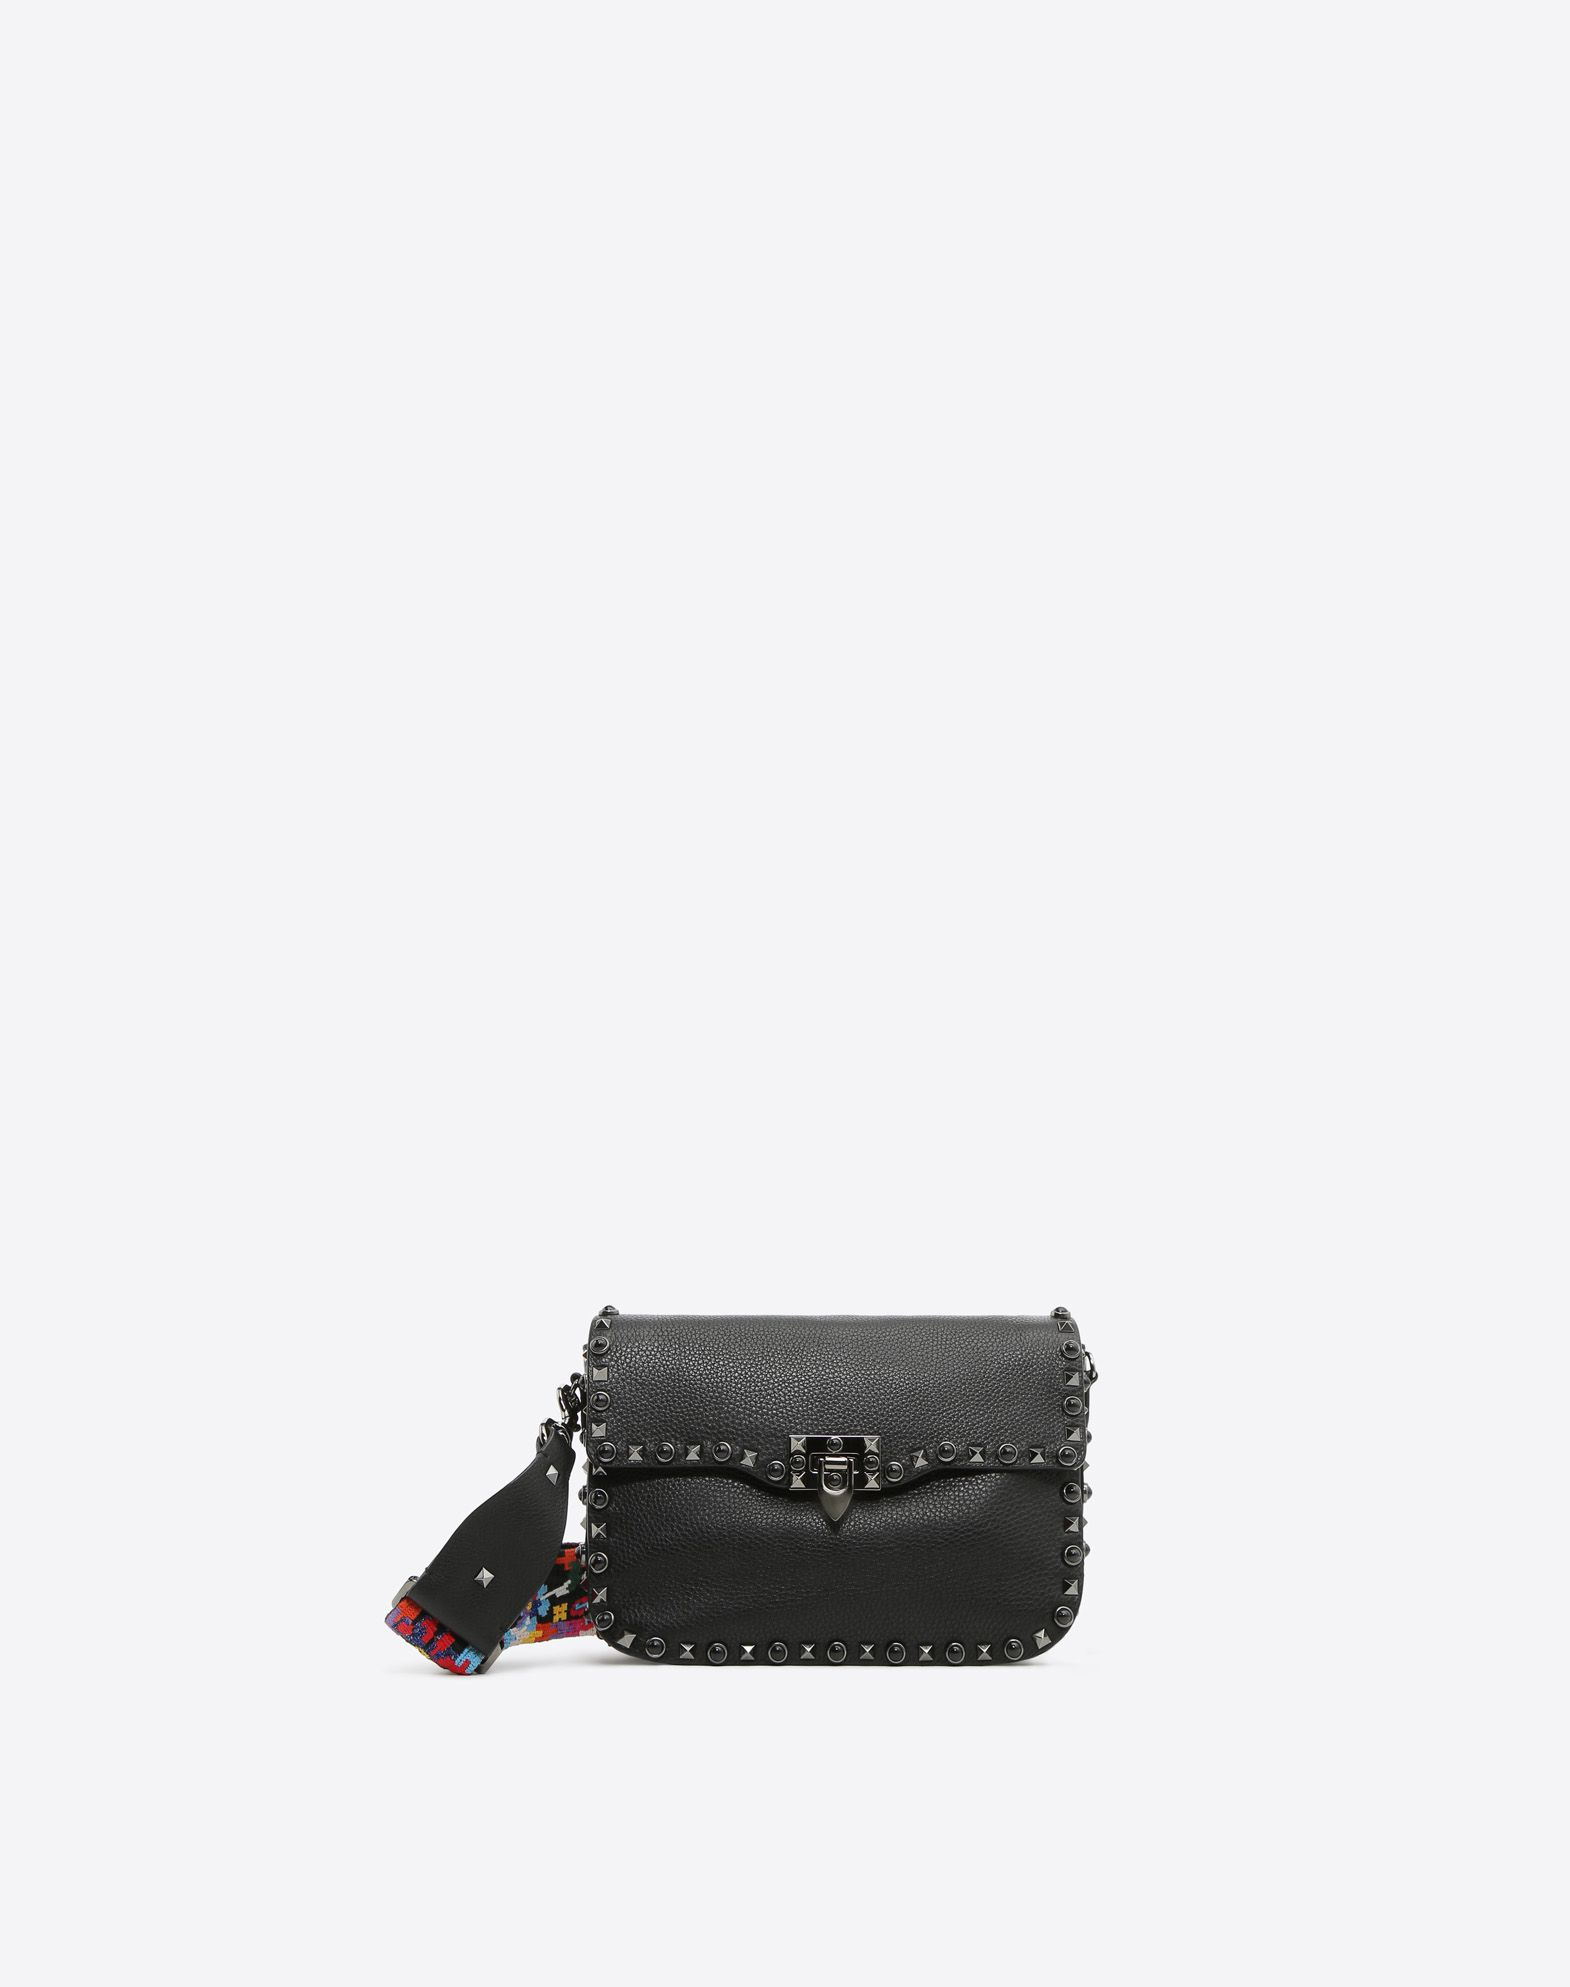 VALENTINO Studded Textured leather Logo Solid colour Framed closure Internal zip pocket Removable shoulder strap  45390702an